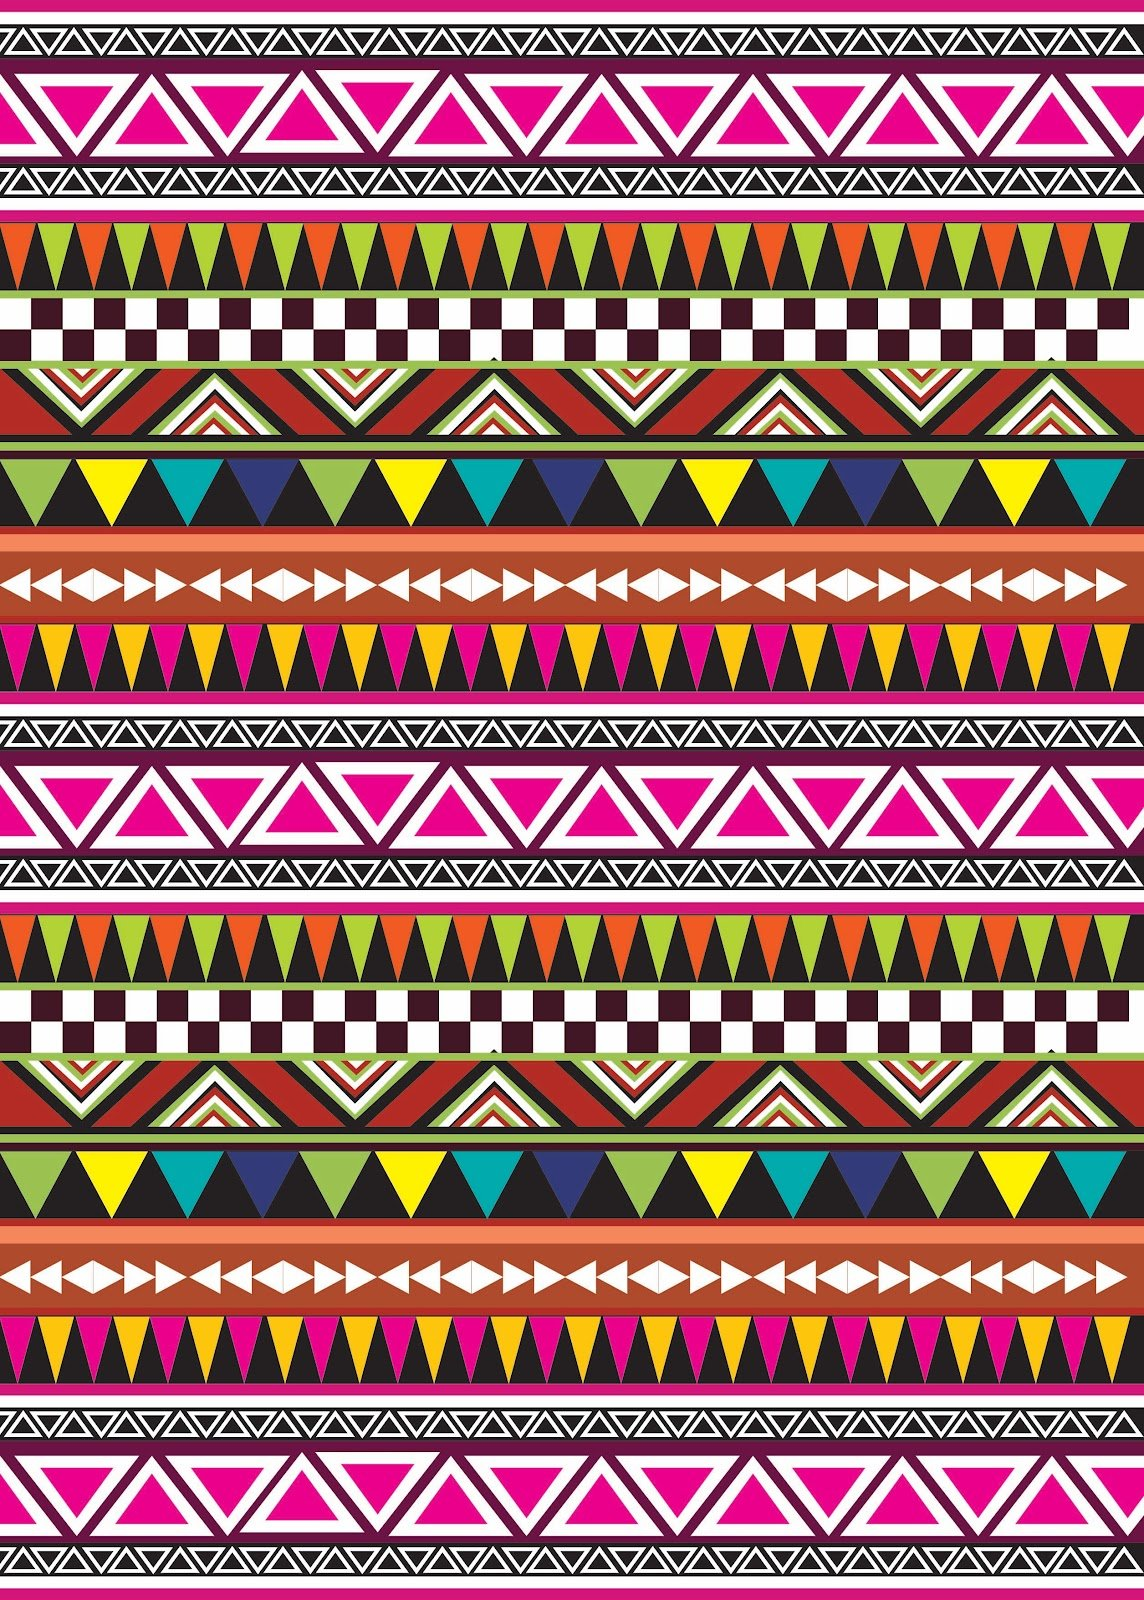 [38+] African Tribal Wallpaper on WallpaperSafari